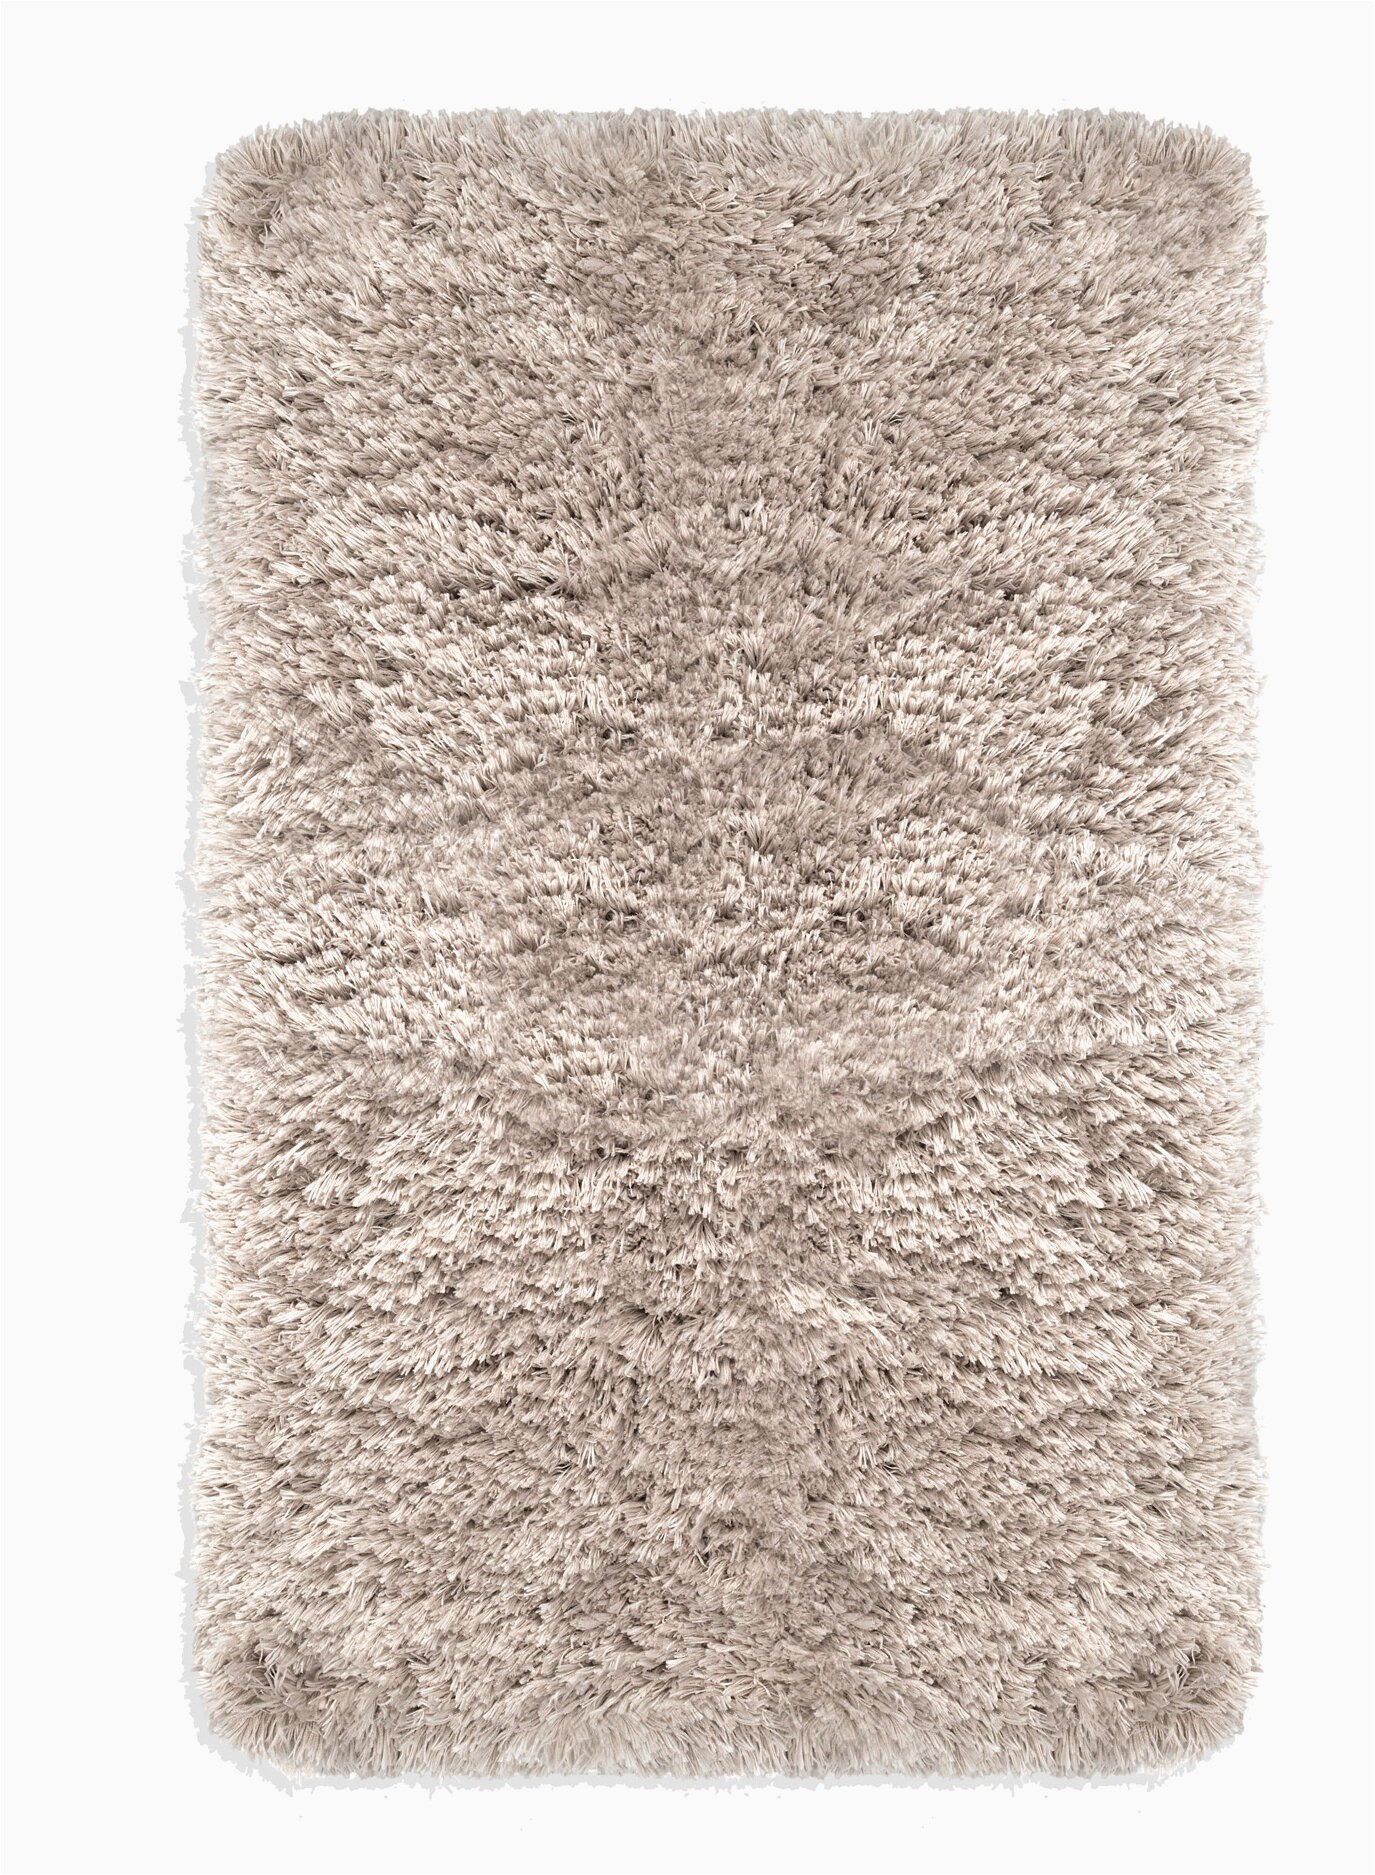 gerwalta rectangular polyester non slip solid bath rug